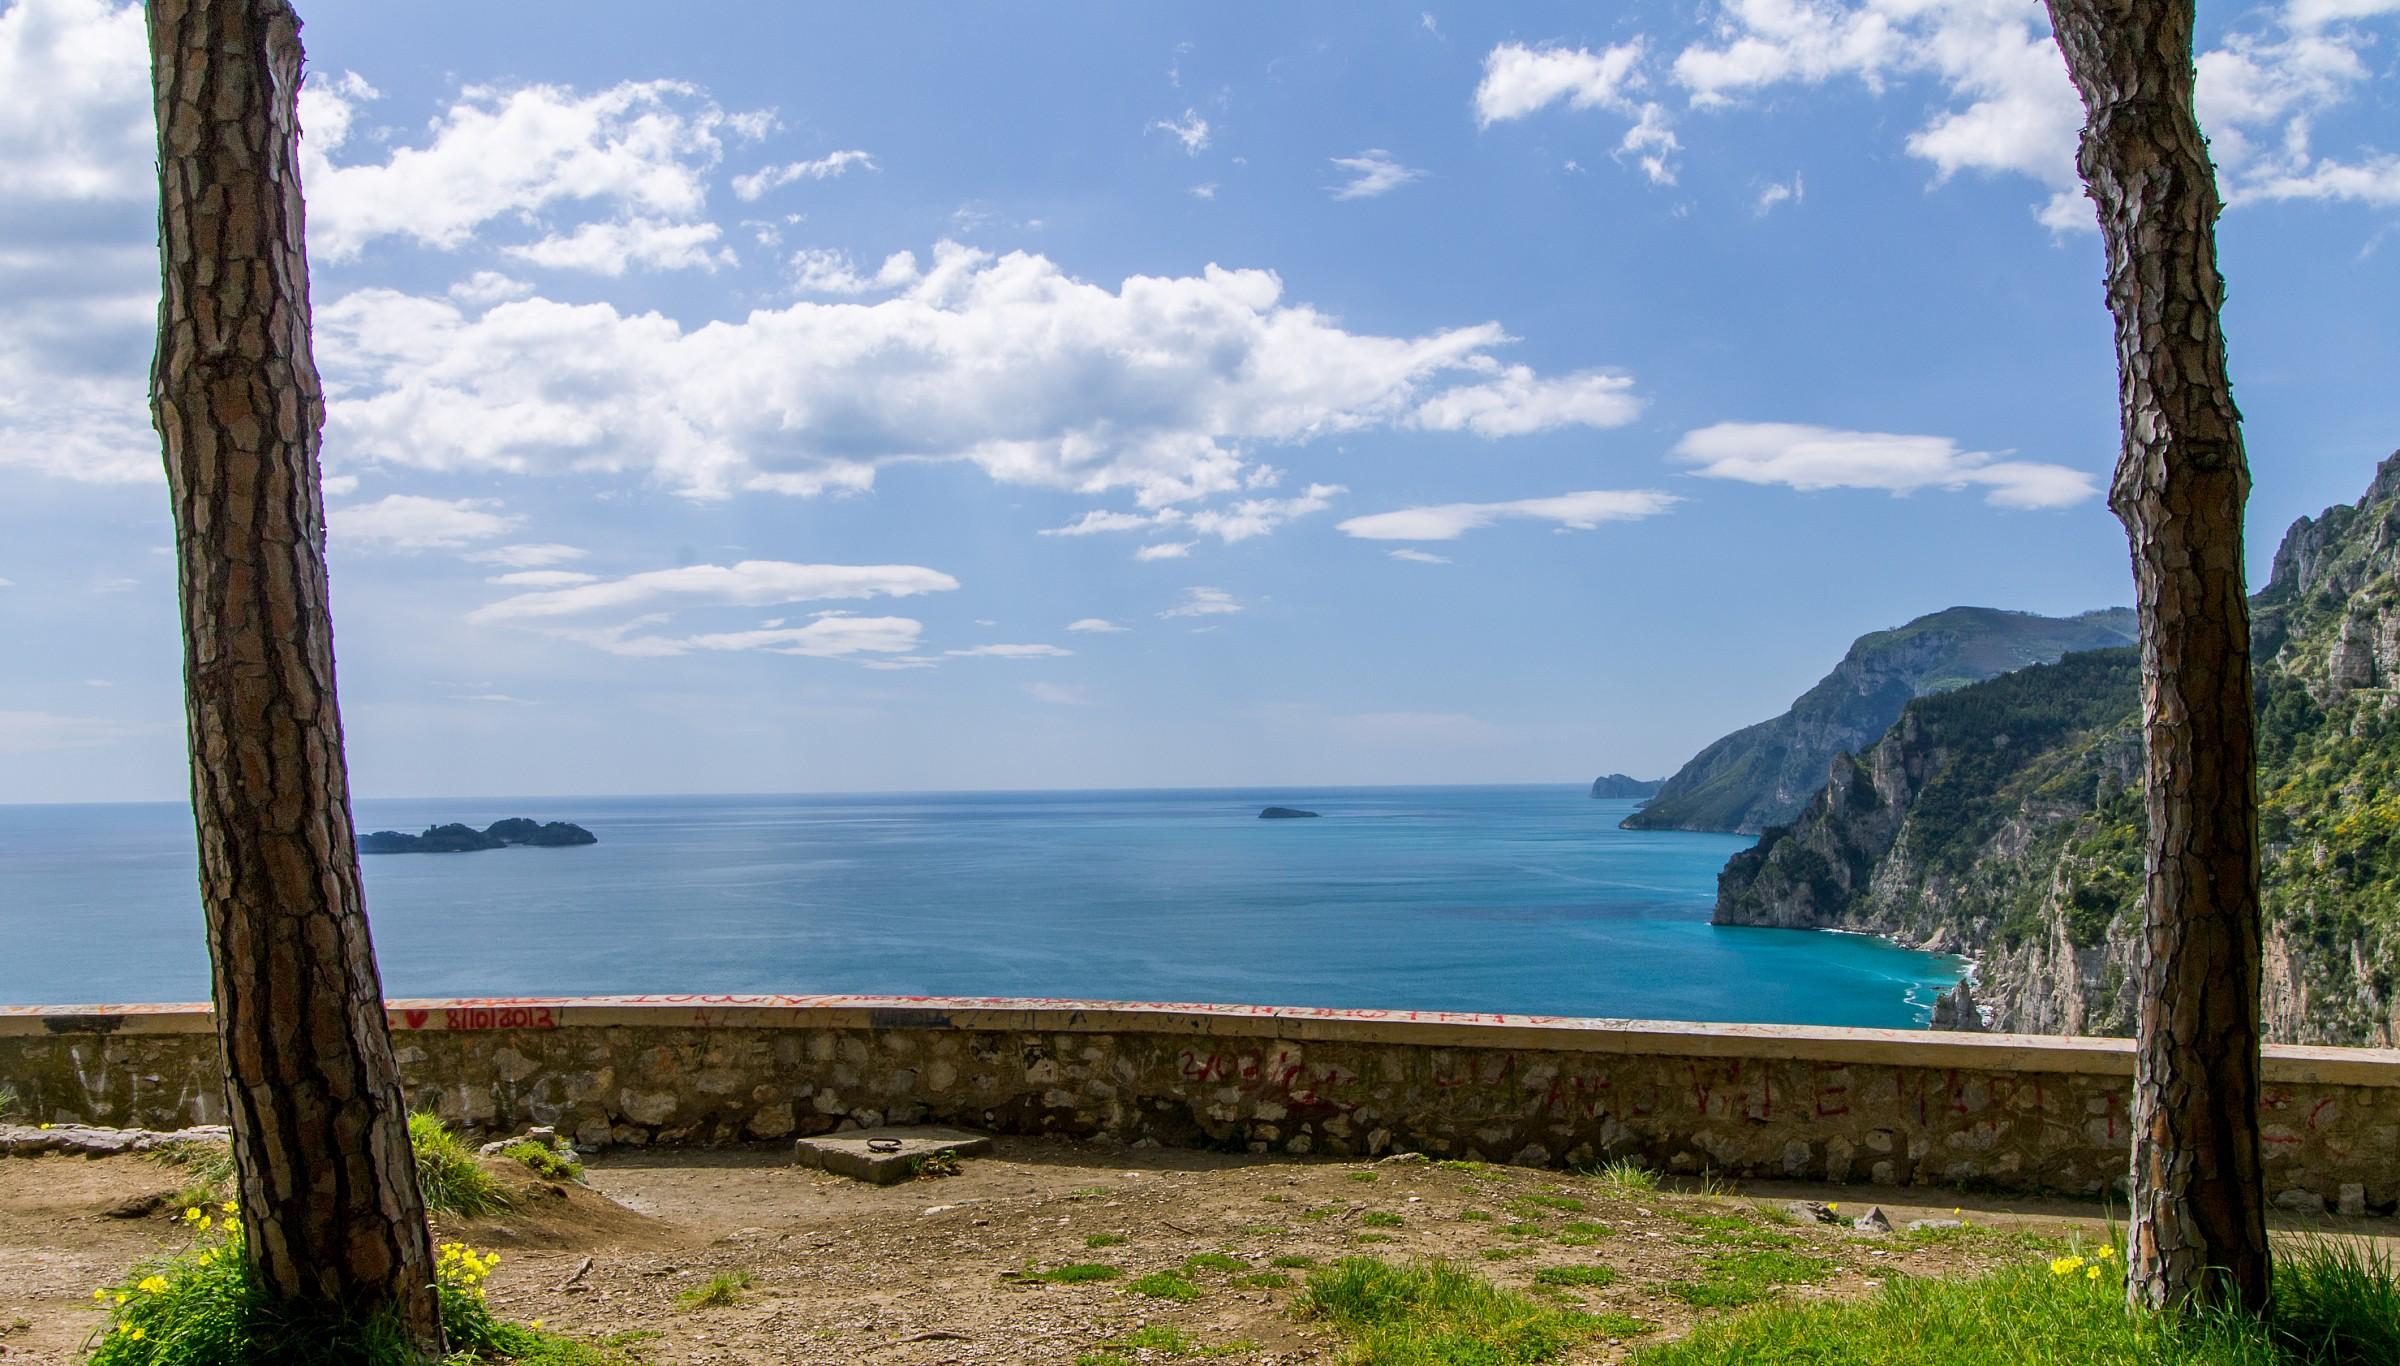 Costiera amalfitana, versante penisola sorrentina...